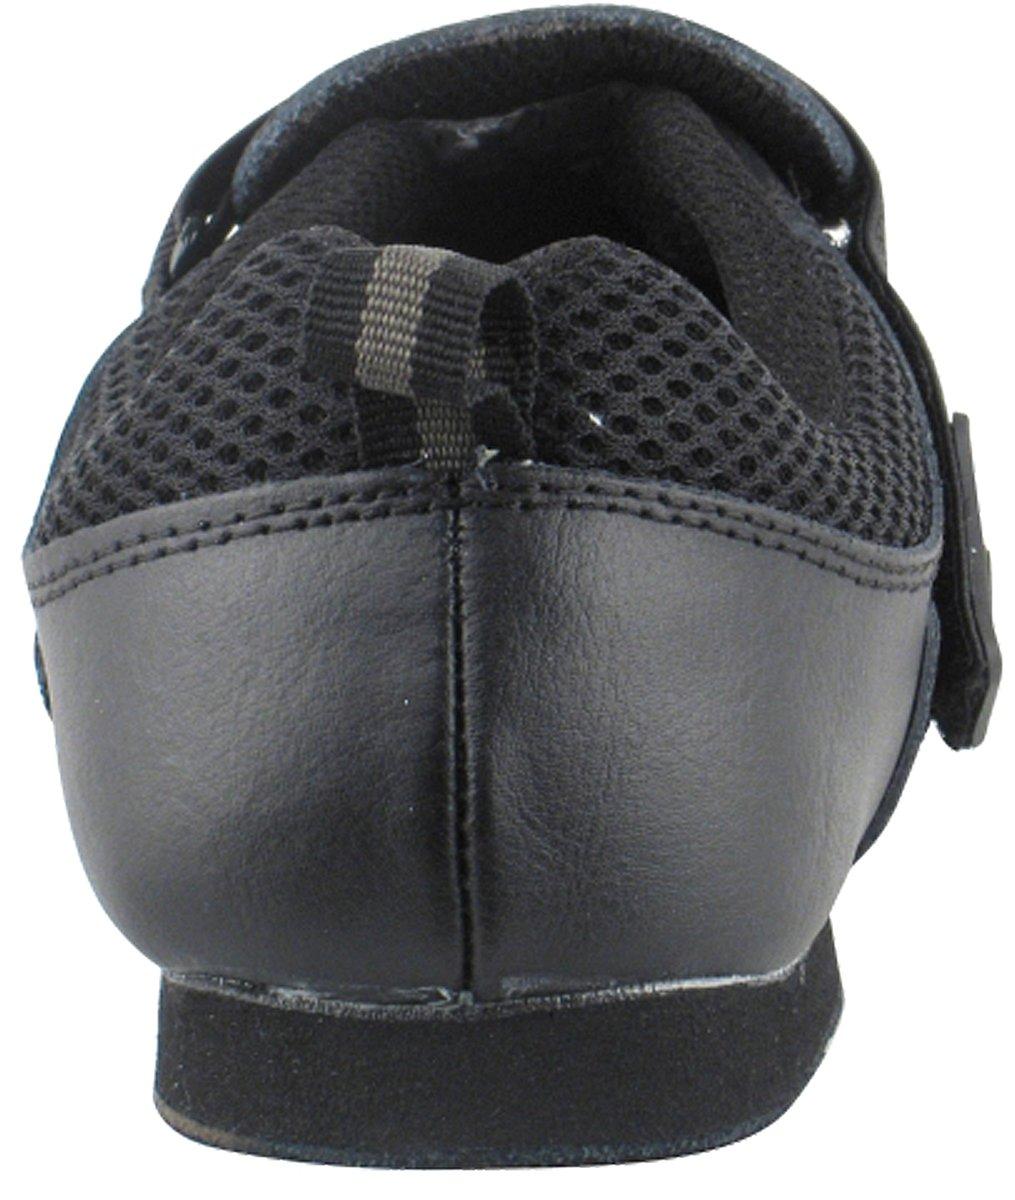 Very Fine Men's Women's Salsa Ballroom Latin Zumba Hip Hop Dance Sneakers Style VFSN009 Bundle with Dance Shoe Wire Brush, Black 4.5 M US (US Women 4.5) by Very Fine Dance Shoes (Image #4)